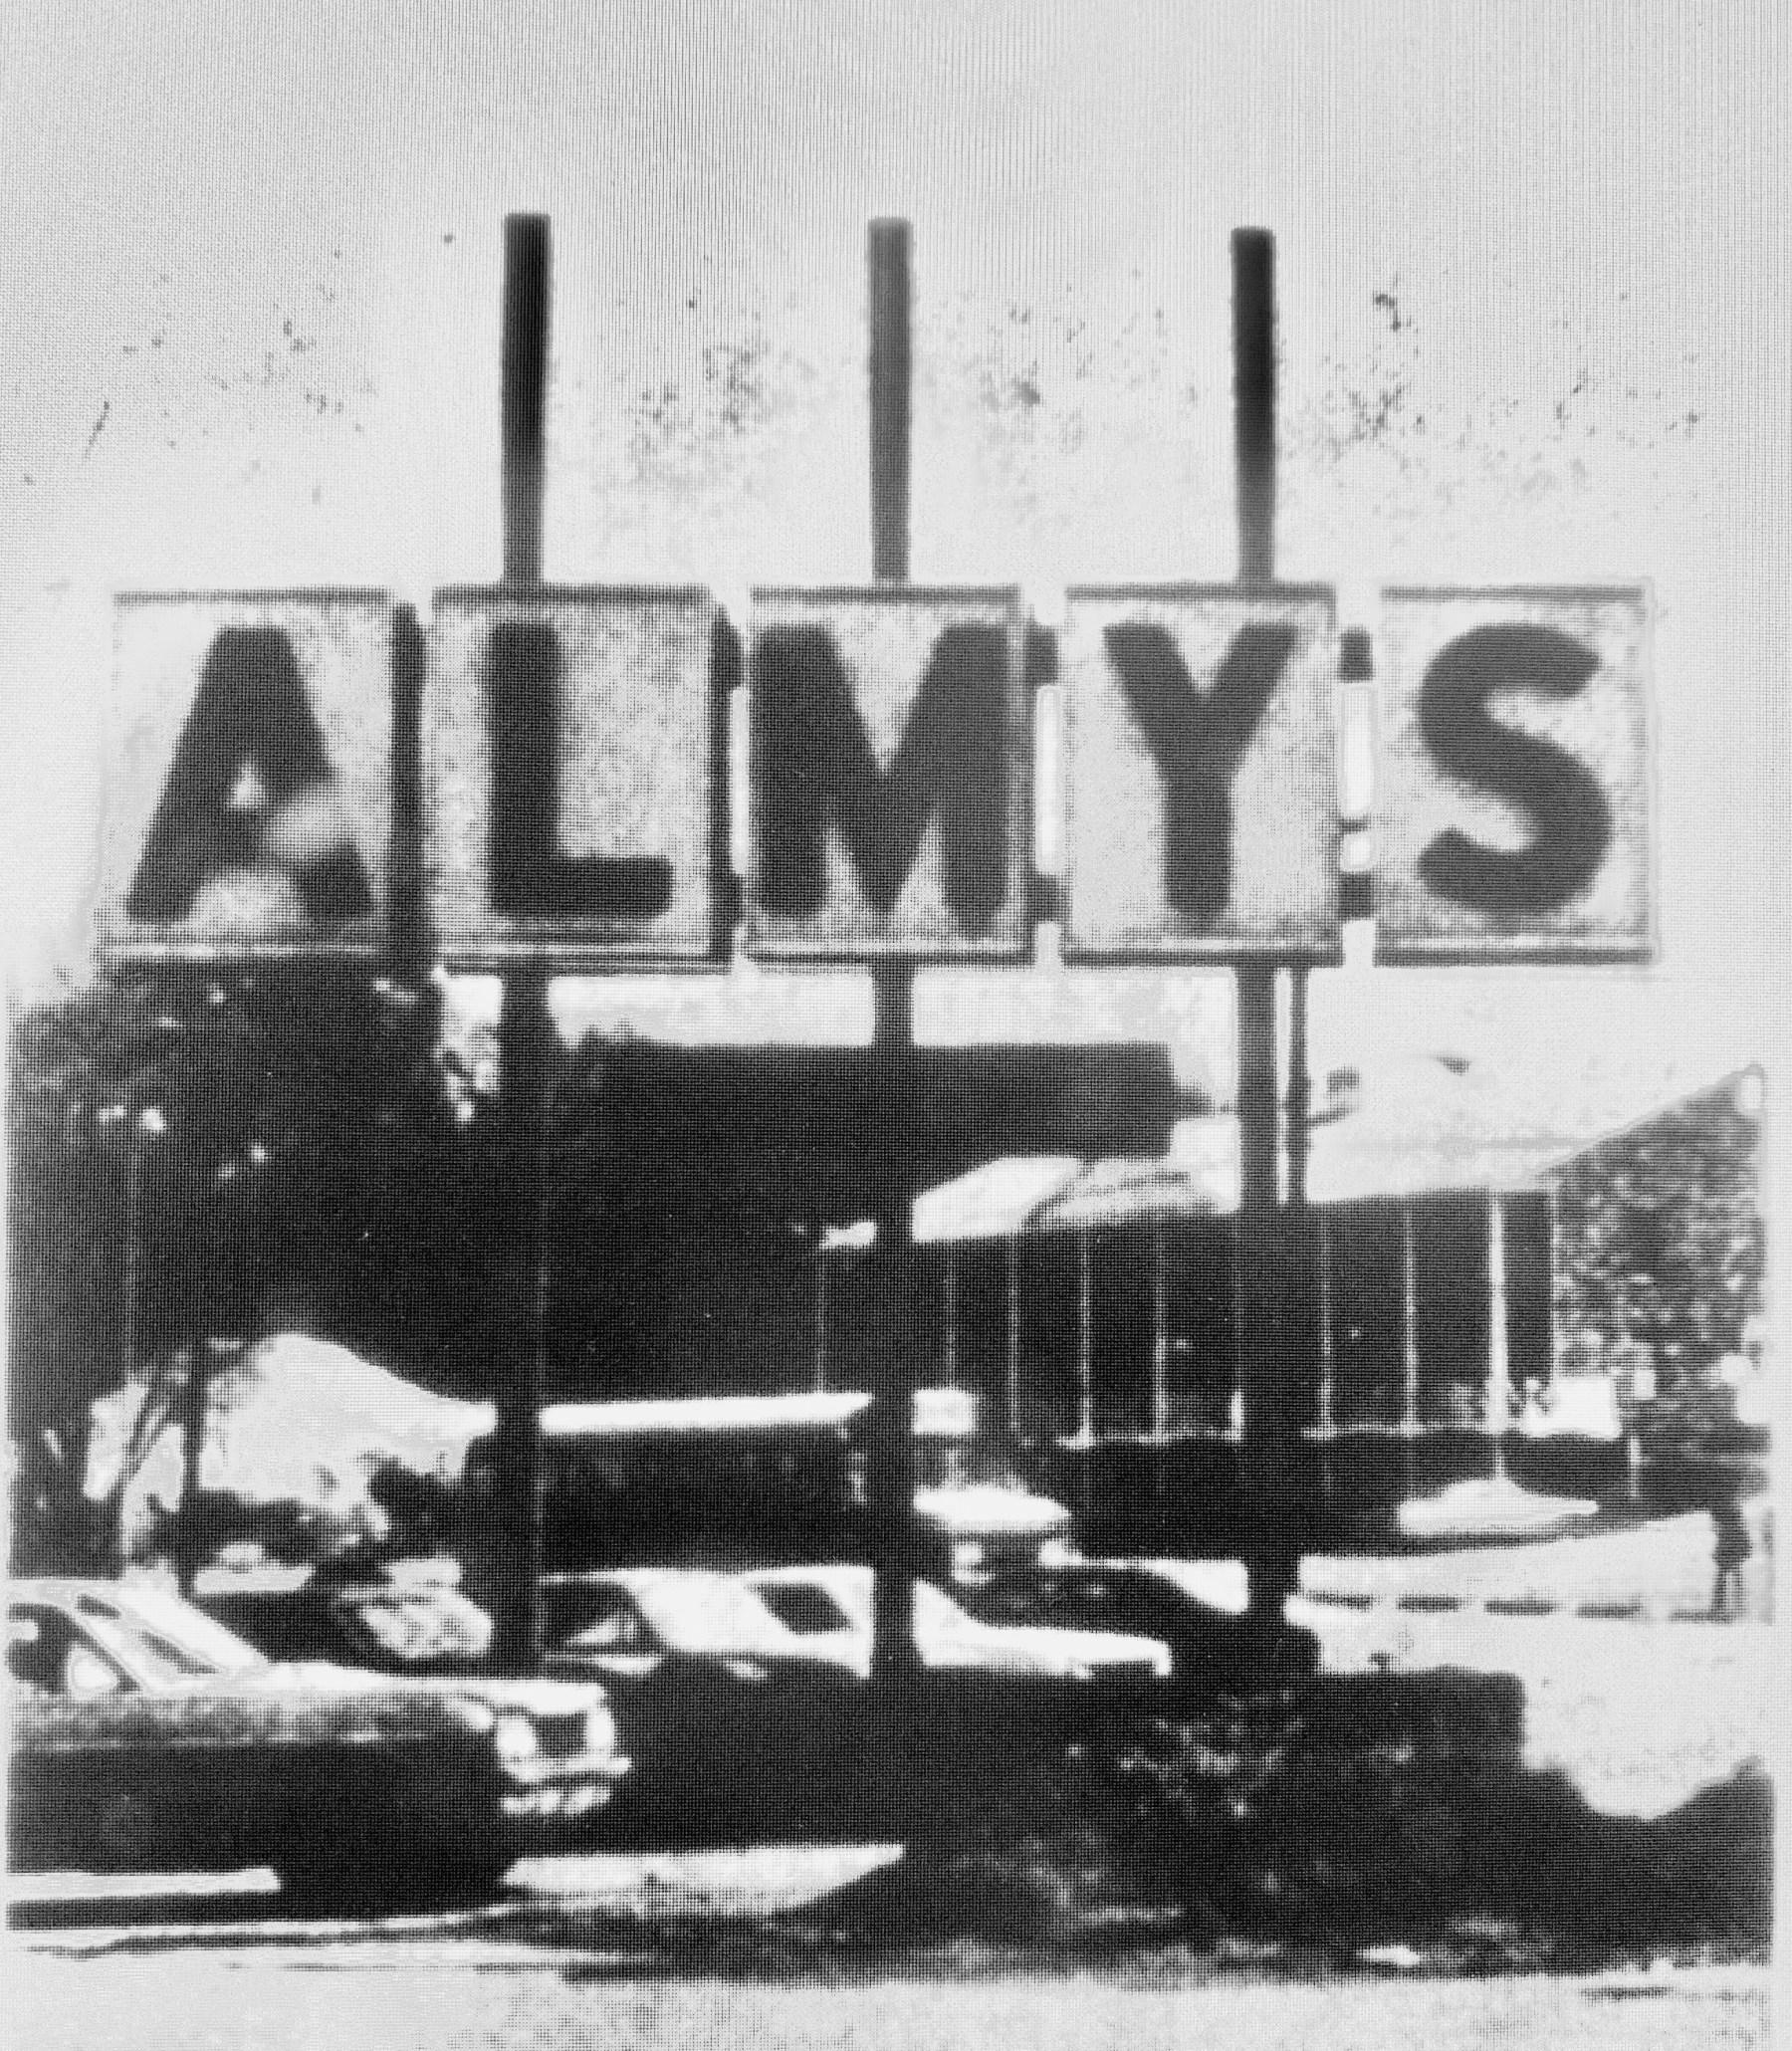 Almy's sign, 1971 Burlington, MA